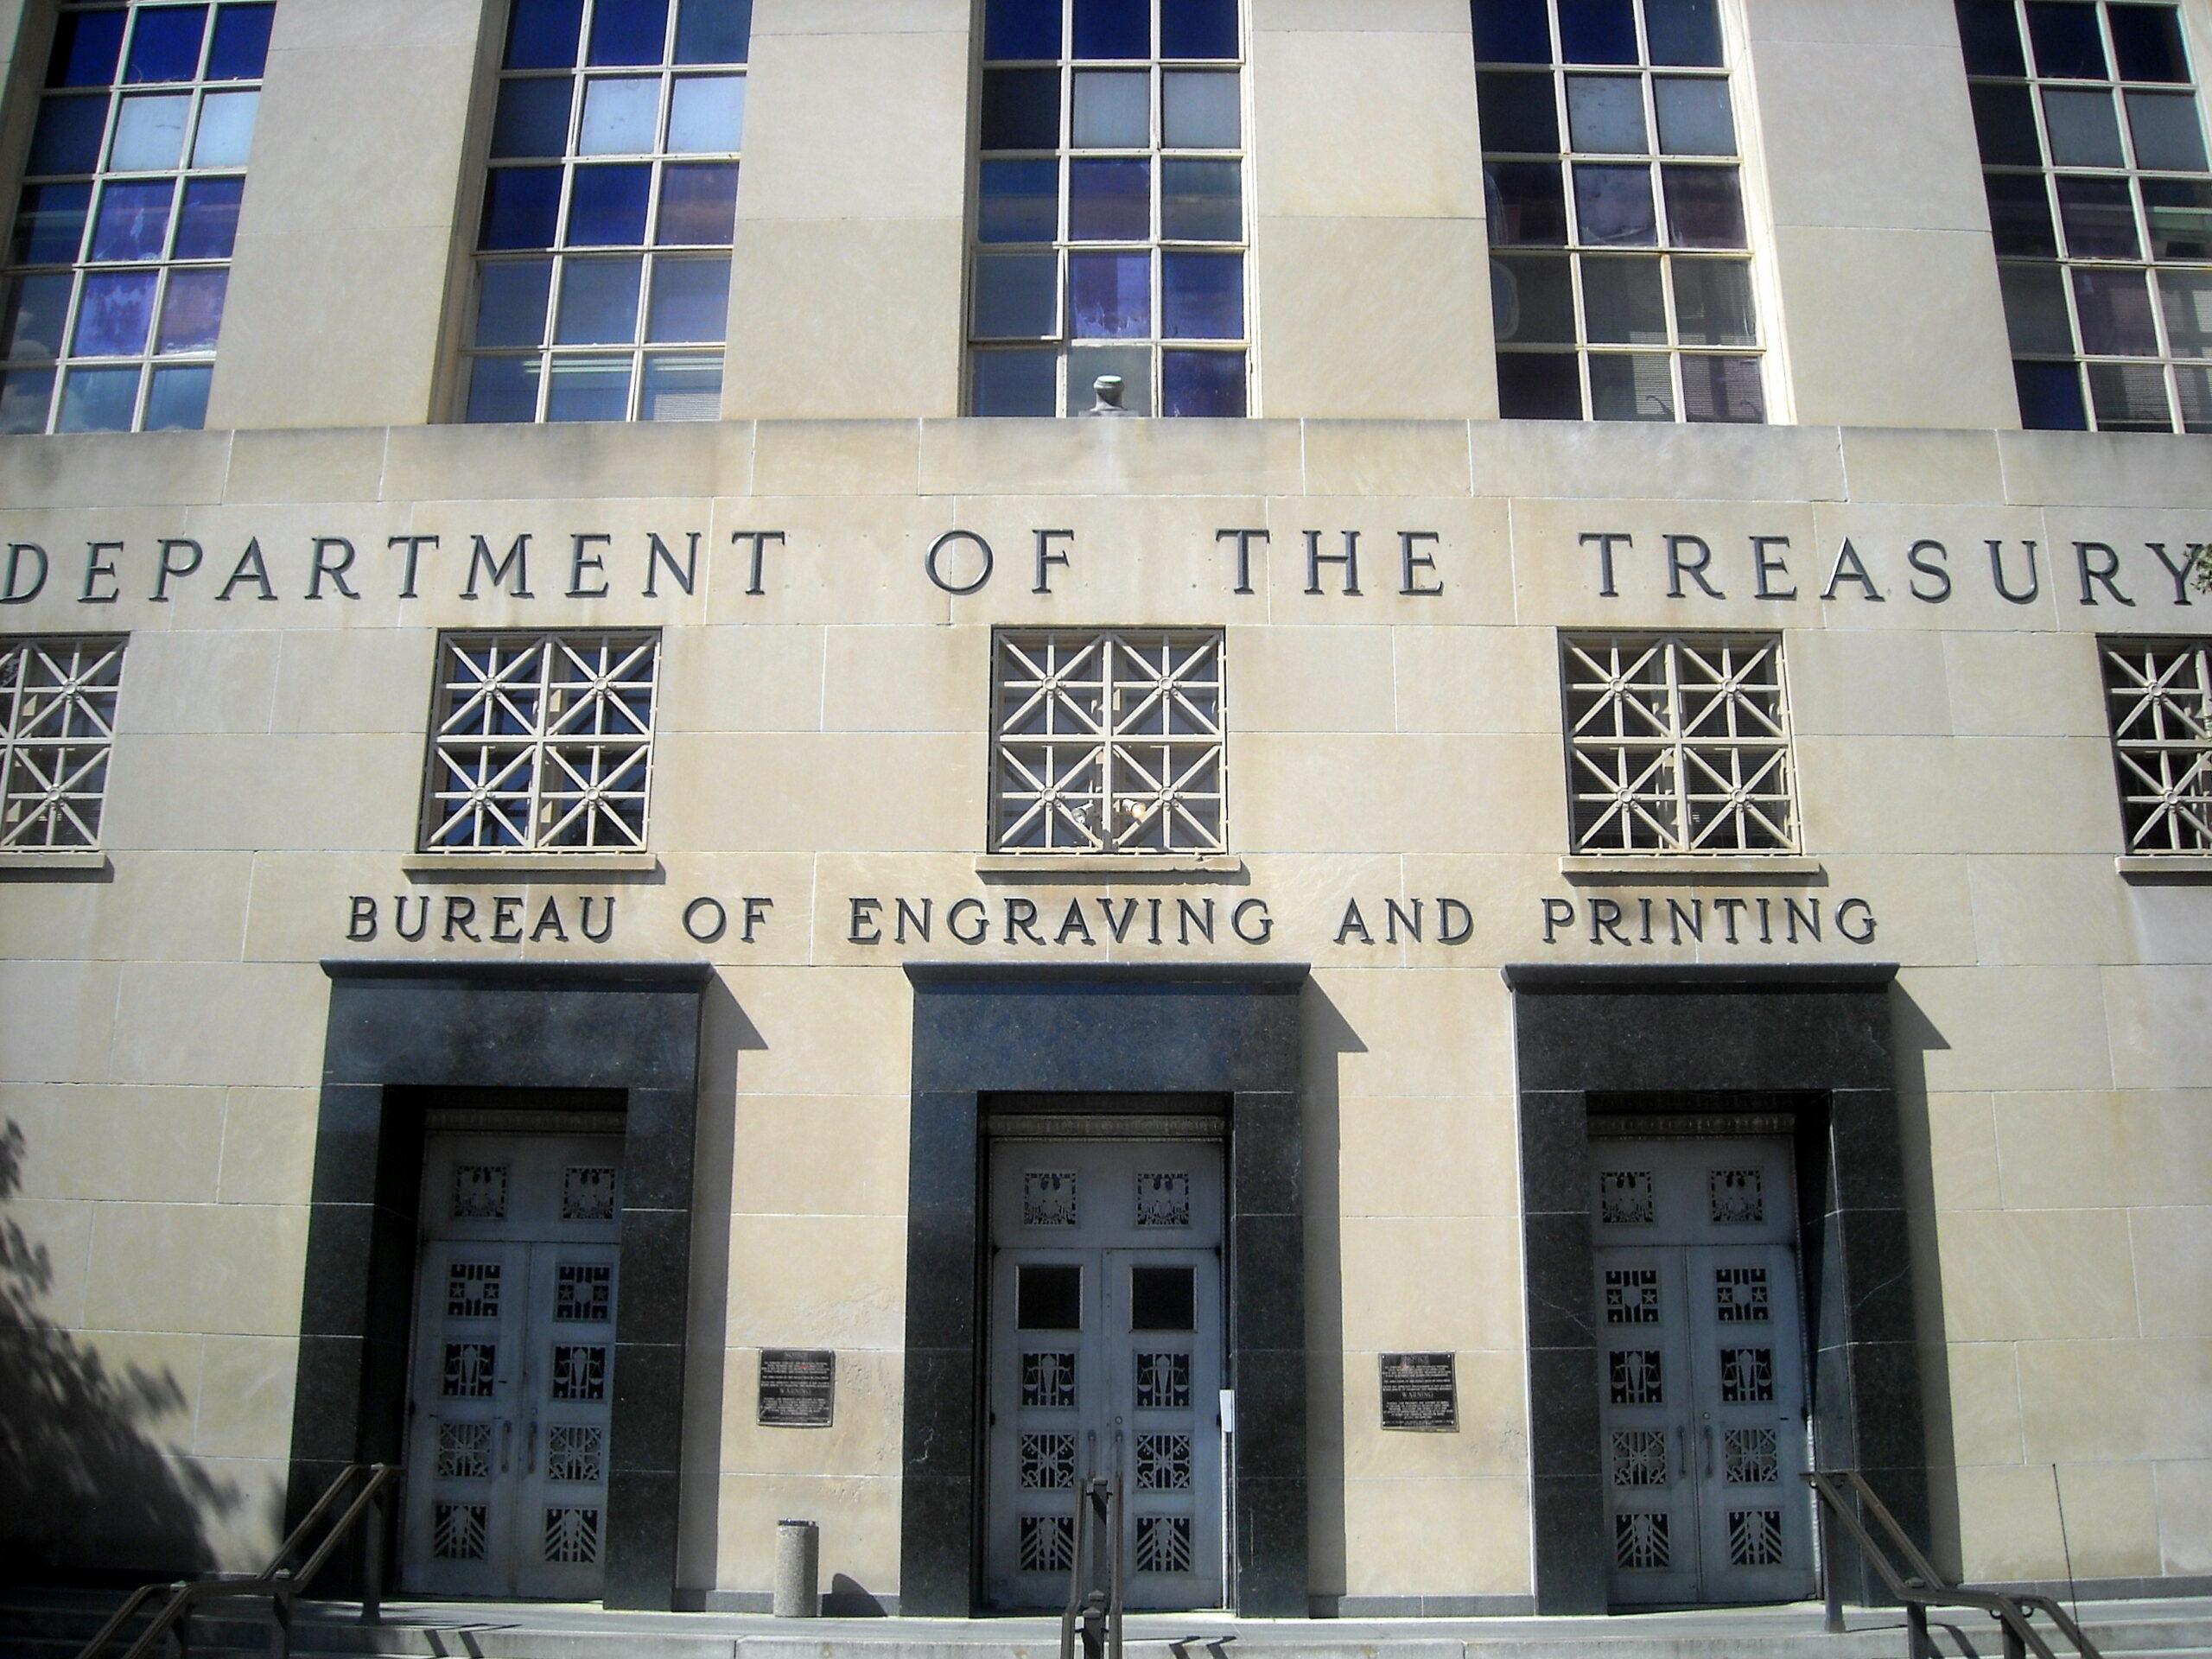 Bureau_of_Engraving_and_Printing,_entrance_-_Washington,_D.C.